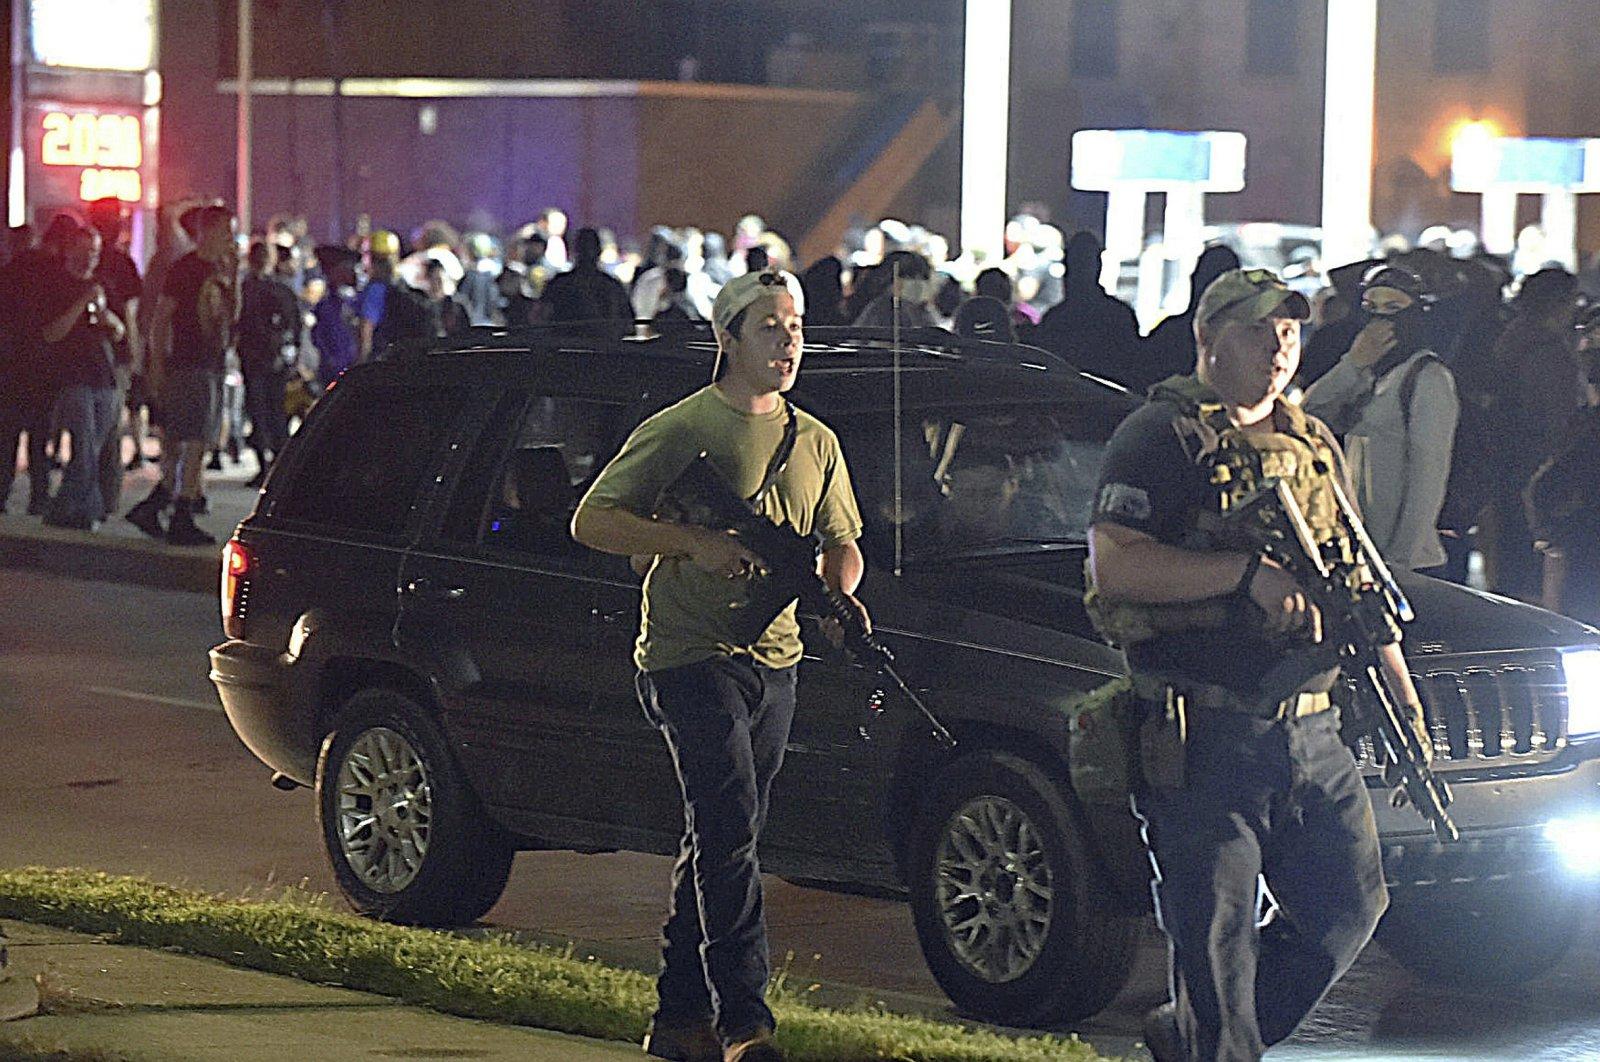 Kyle Rittenhouse (L) walks with another armed civilian, Kenosha, Wis., Aug. 25, 2020. (AP Photo)